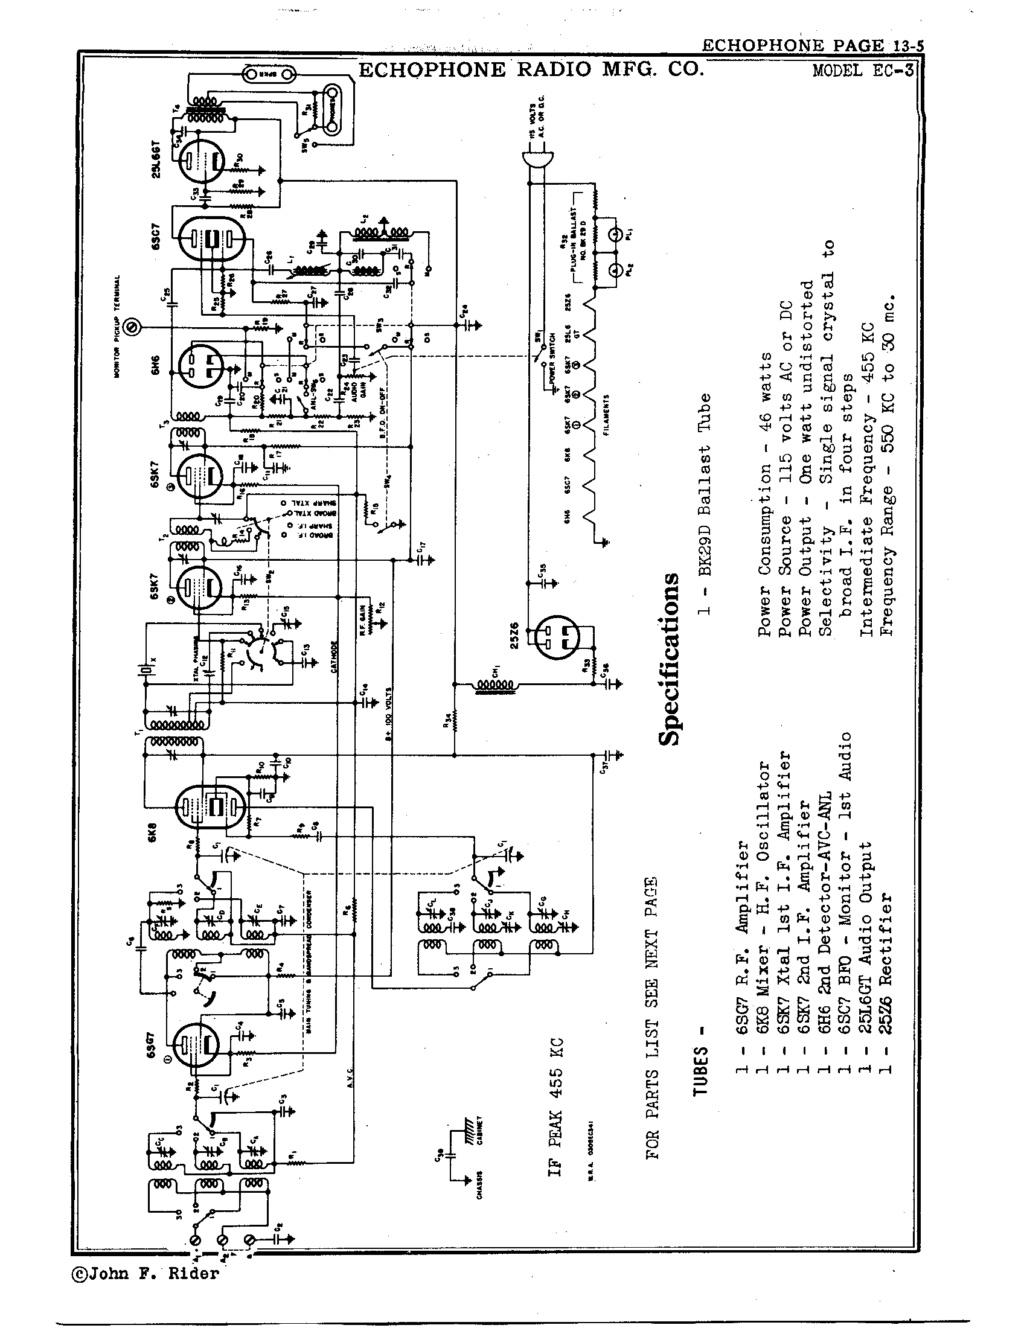 Hallicrafters / Echophone EC-1 Echoph12